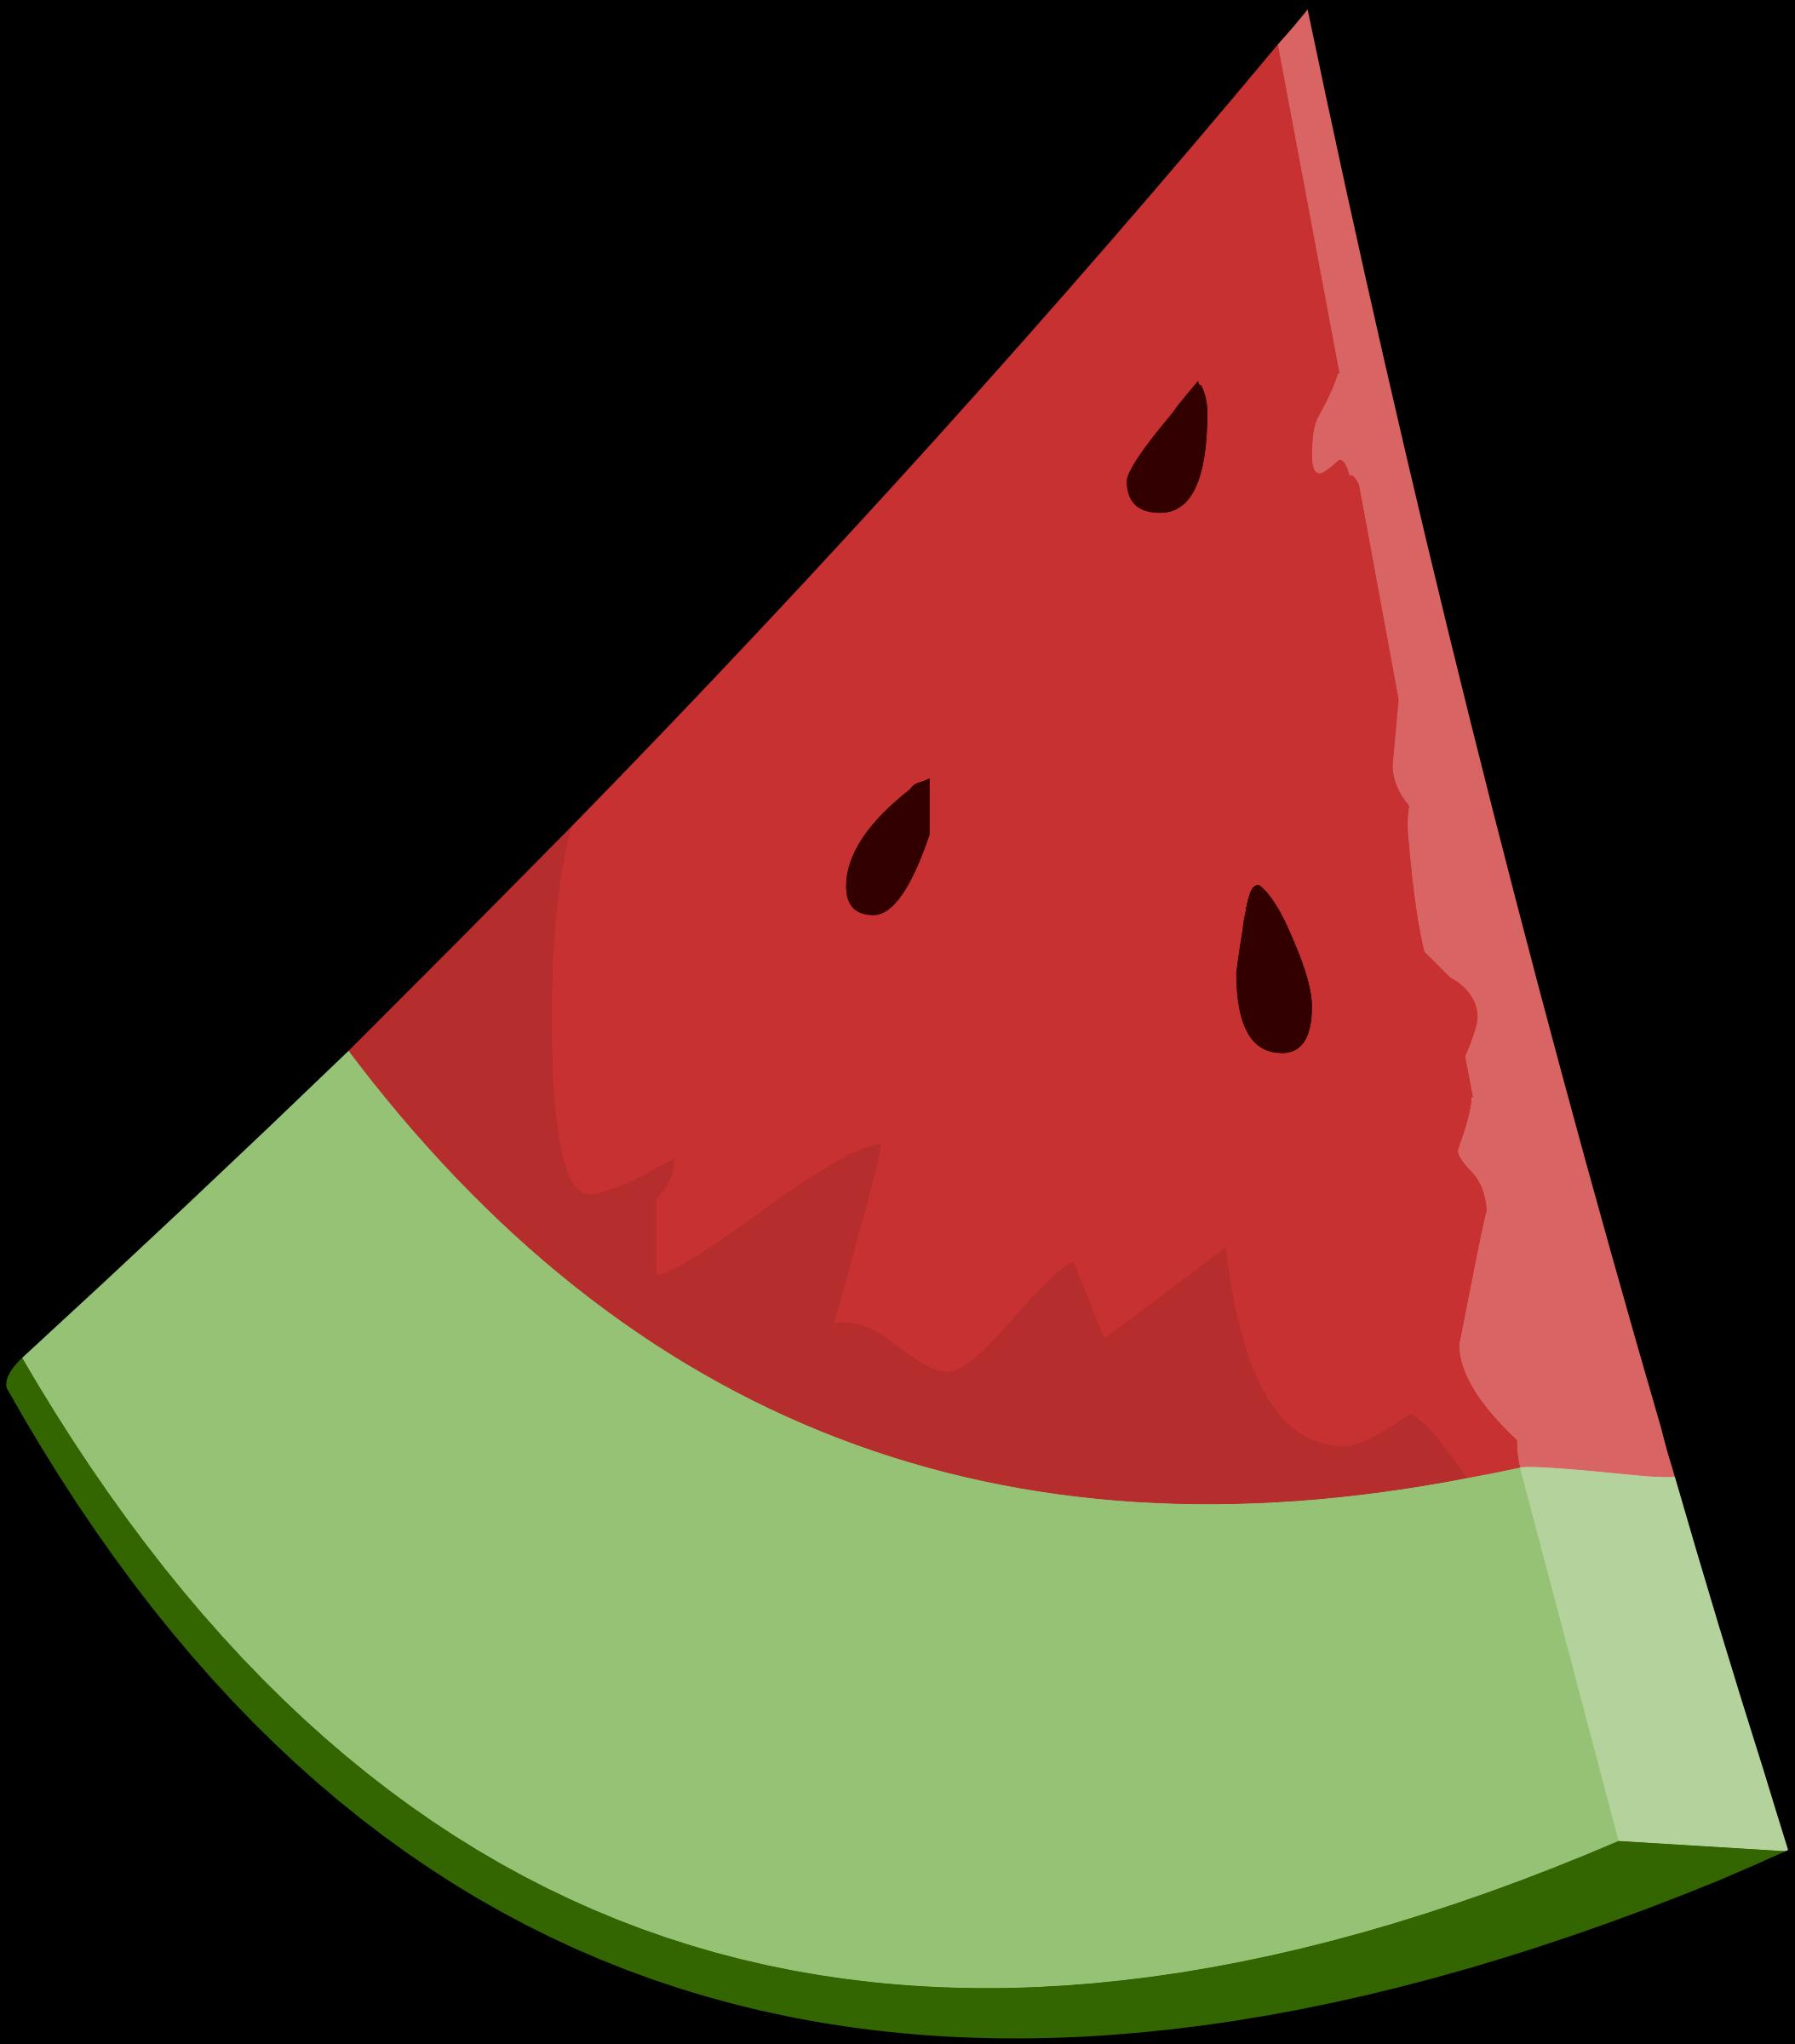 Clipart watermelon slice wedge